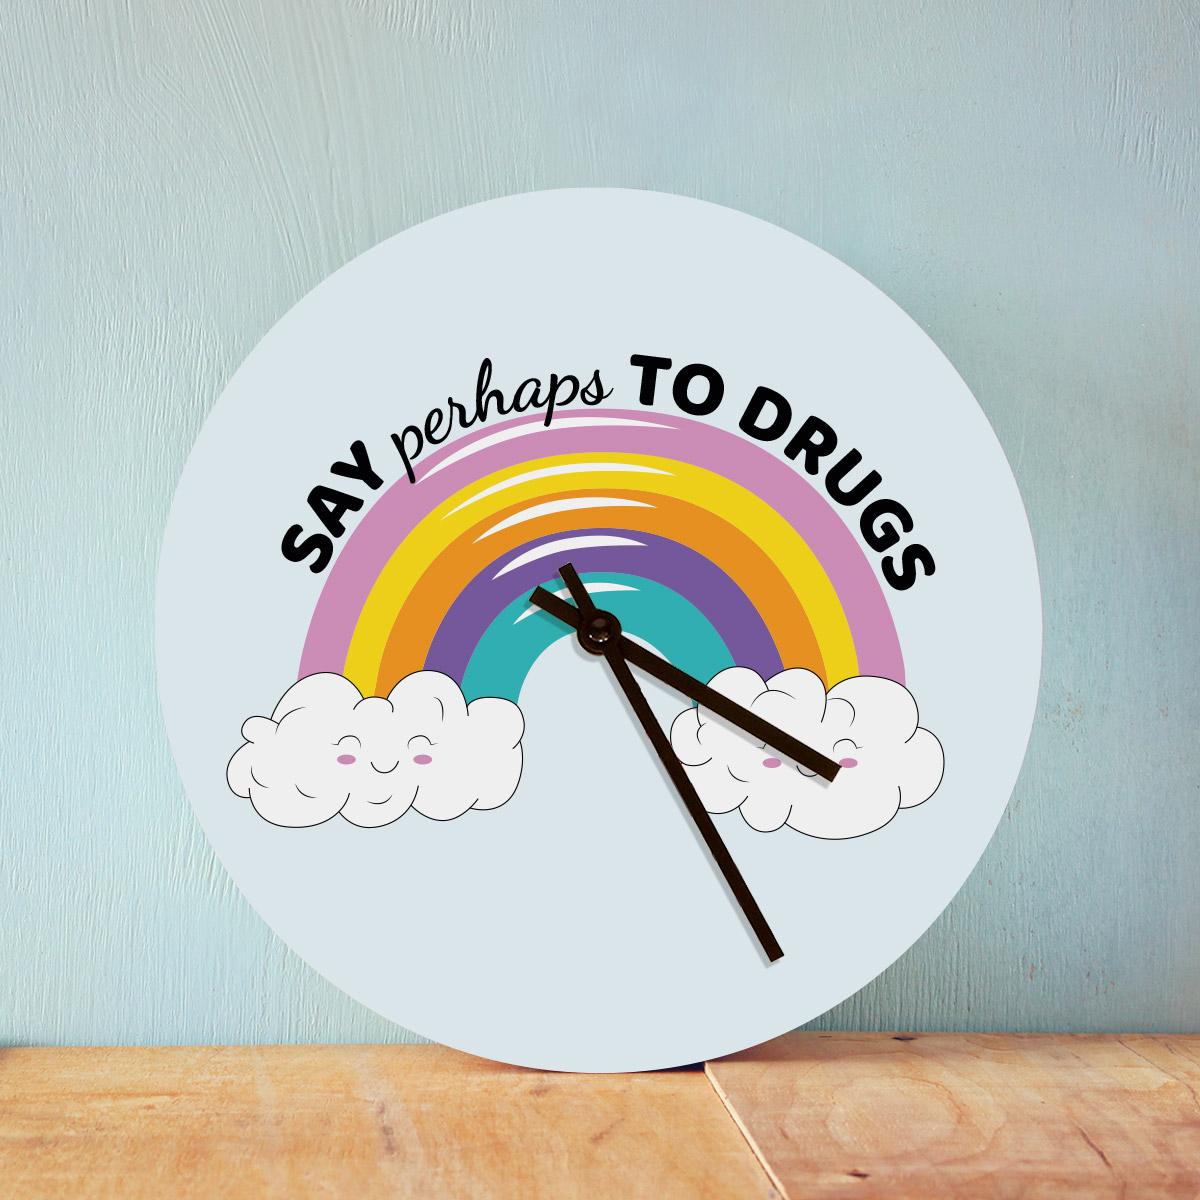 Say Perhaps To Drugs Klok